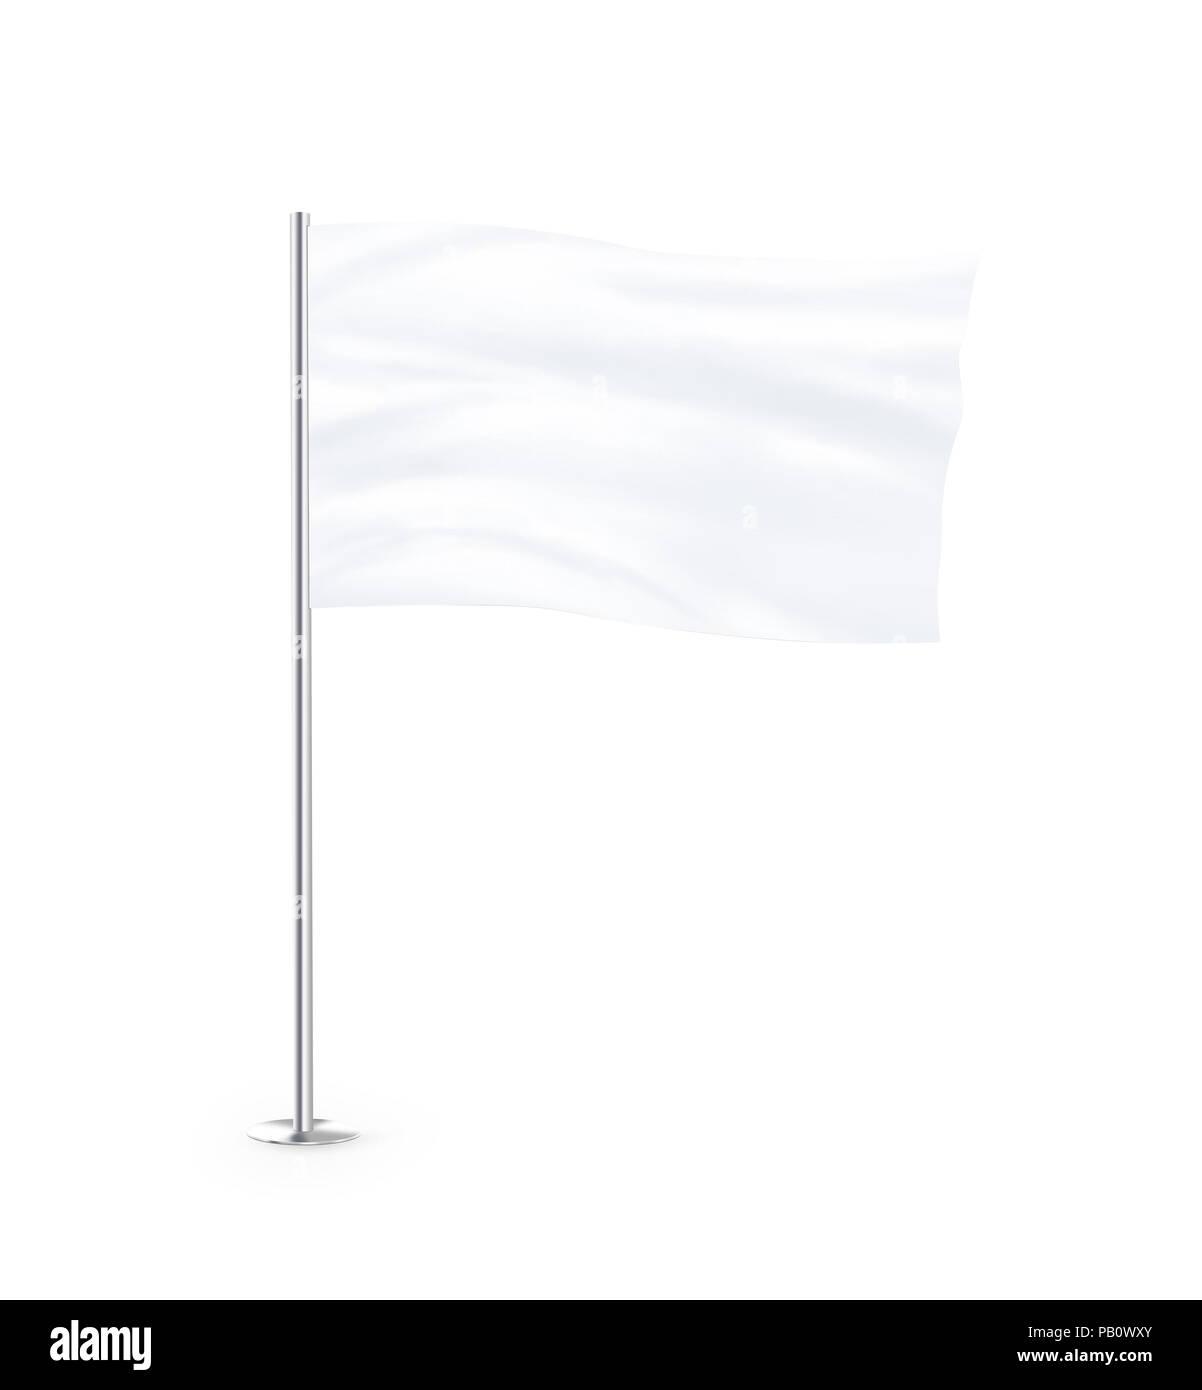 Blank white flag mock up stand at white background isolated. Large wavy flagpole mockup ready for business logo design presentation. Surrender symbol  - Stock Image